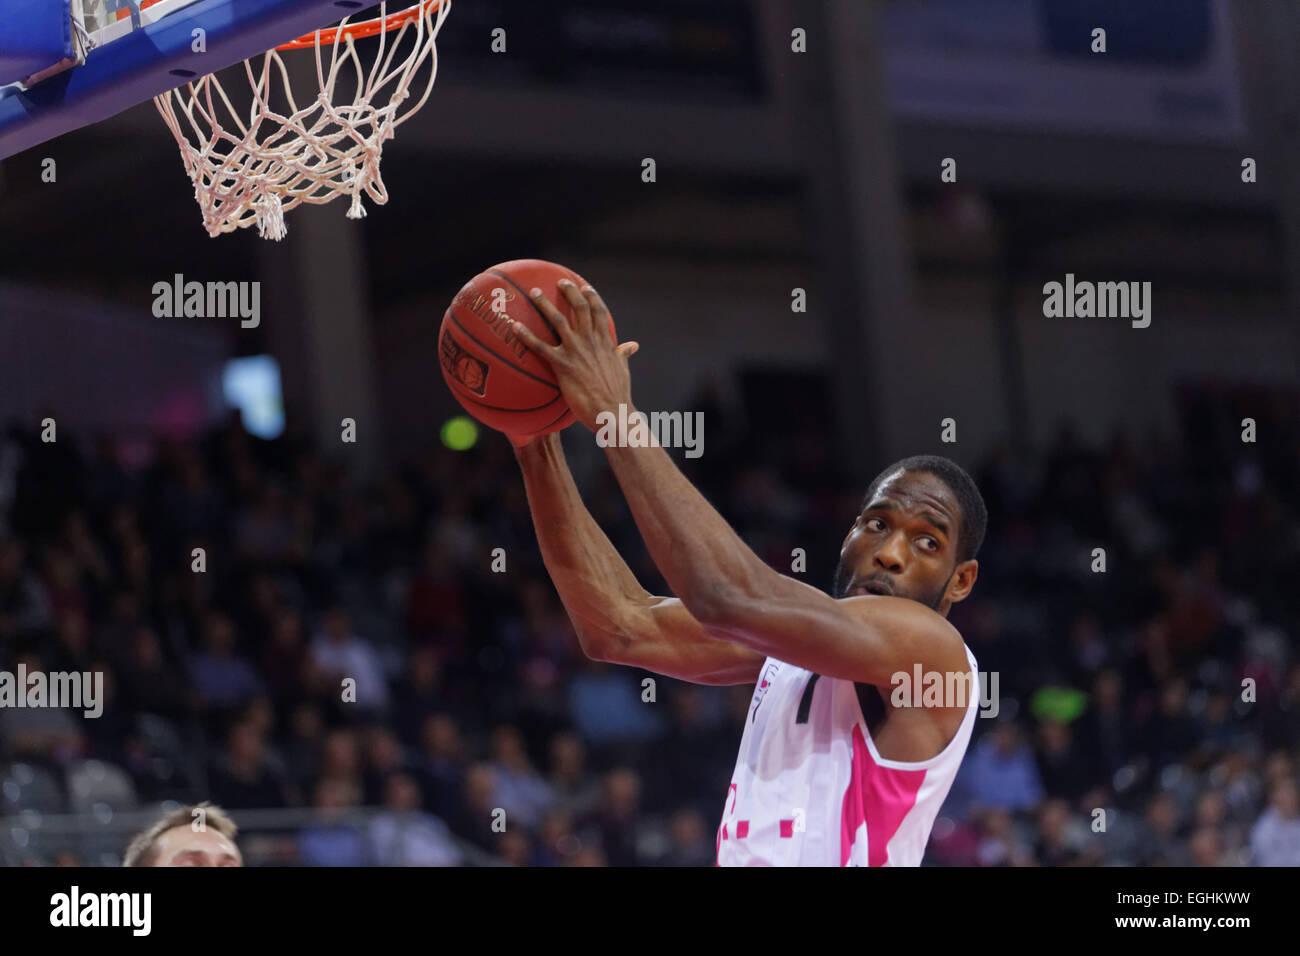 BONN - GERMANY, 24.02.2015, basketball cup qualifier, Telekom Dome, Telekom Baskets vs BG Goettingen: Ryan Brooks Stock Photo